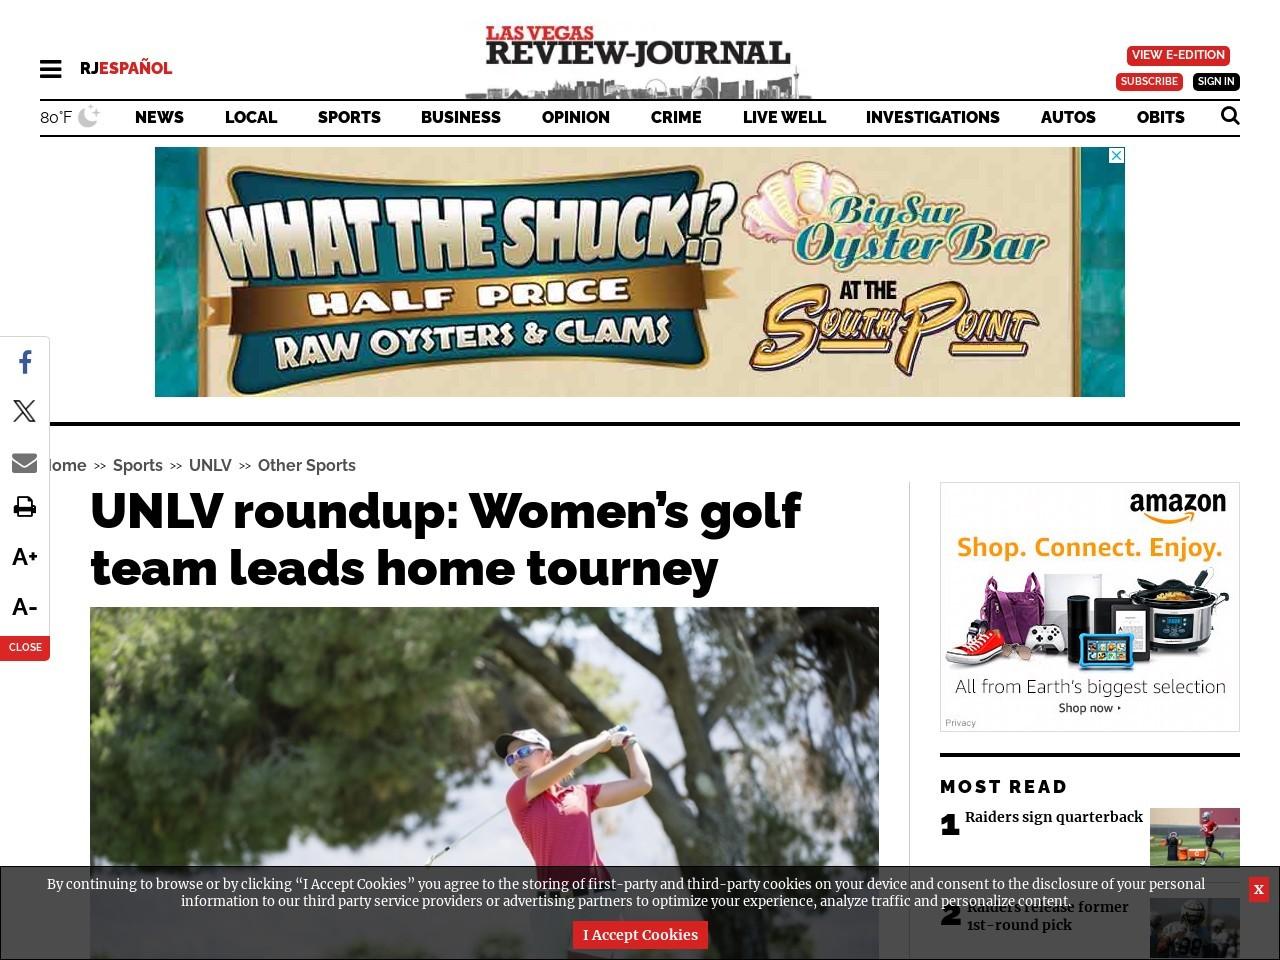 UNLV roundup: Women's golf team leads home tourney